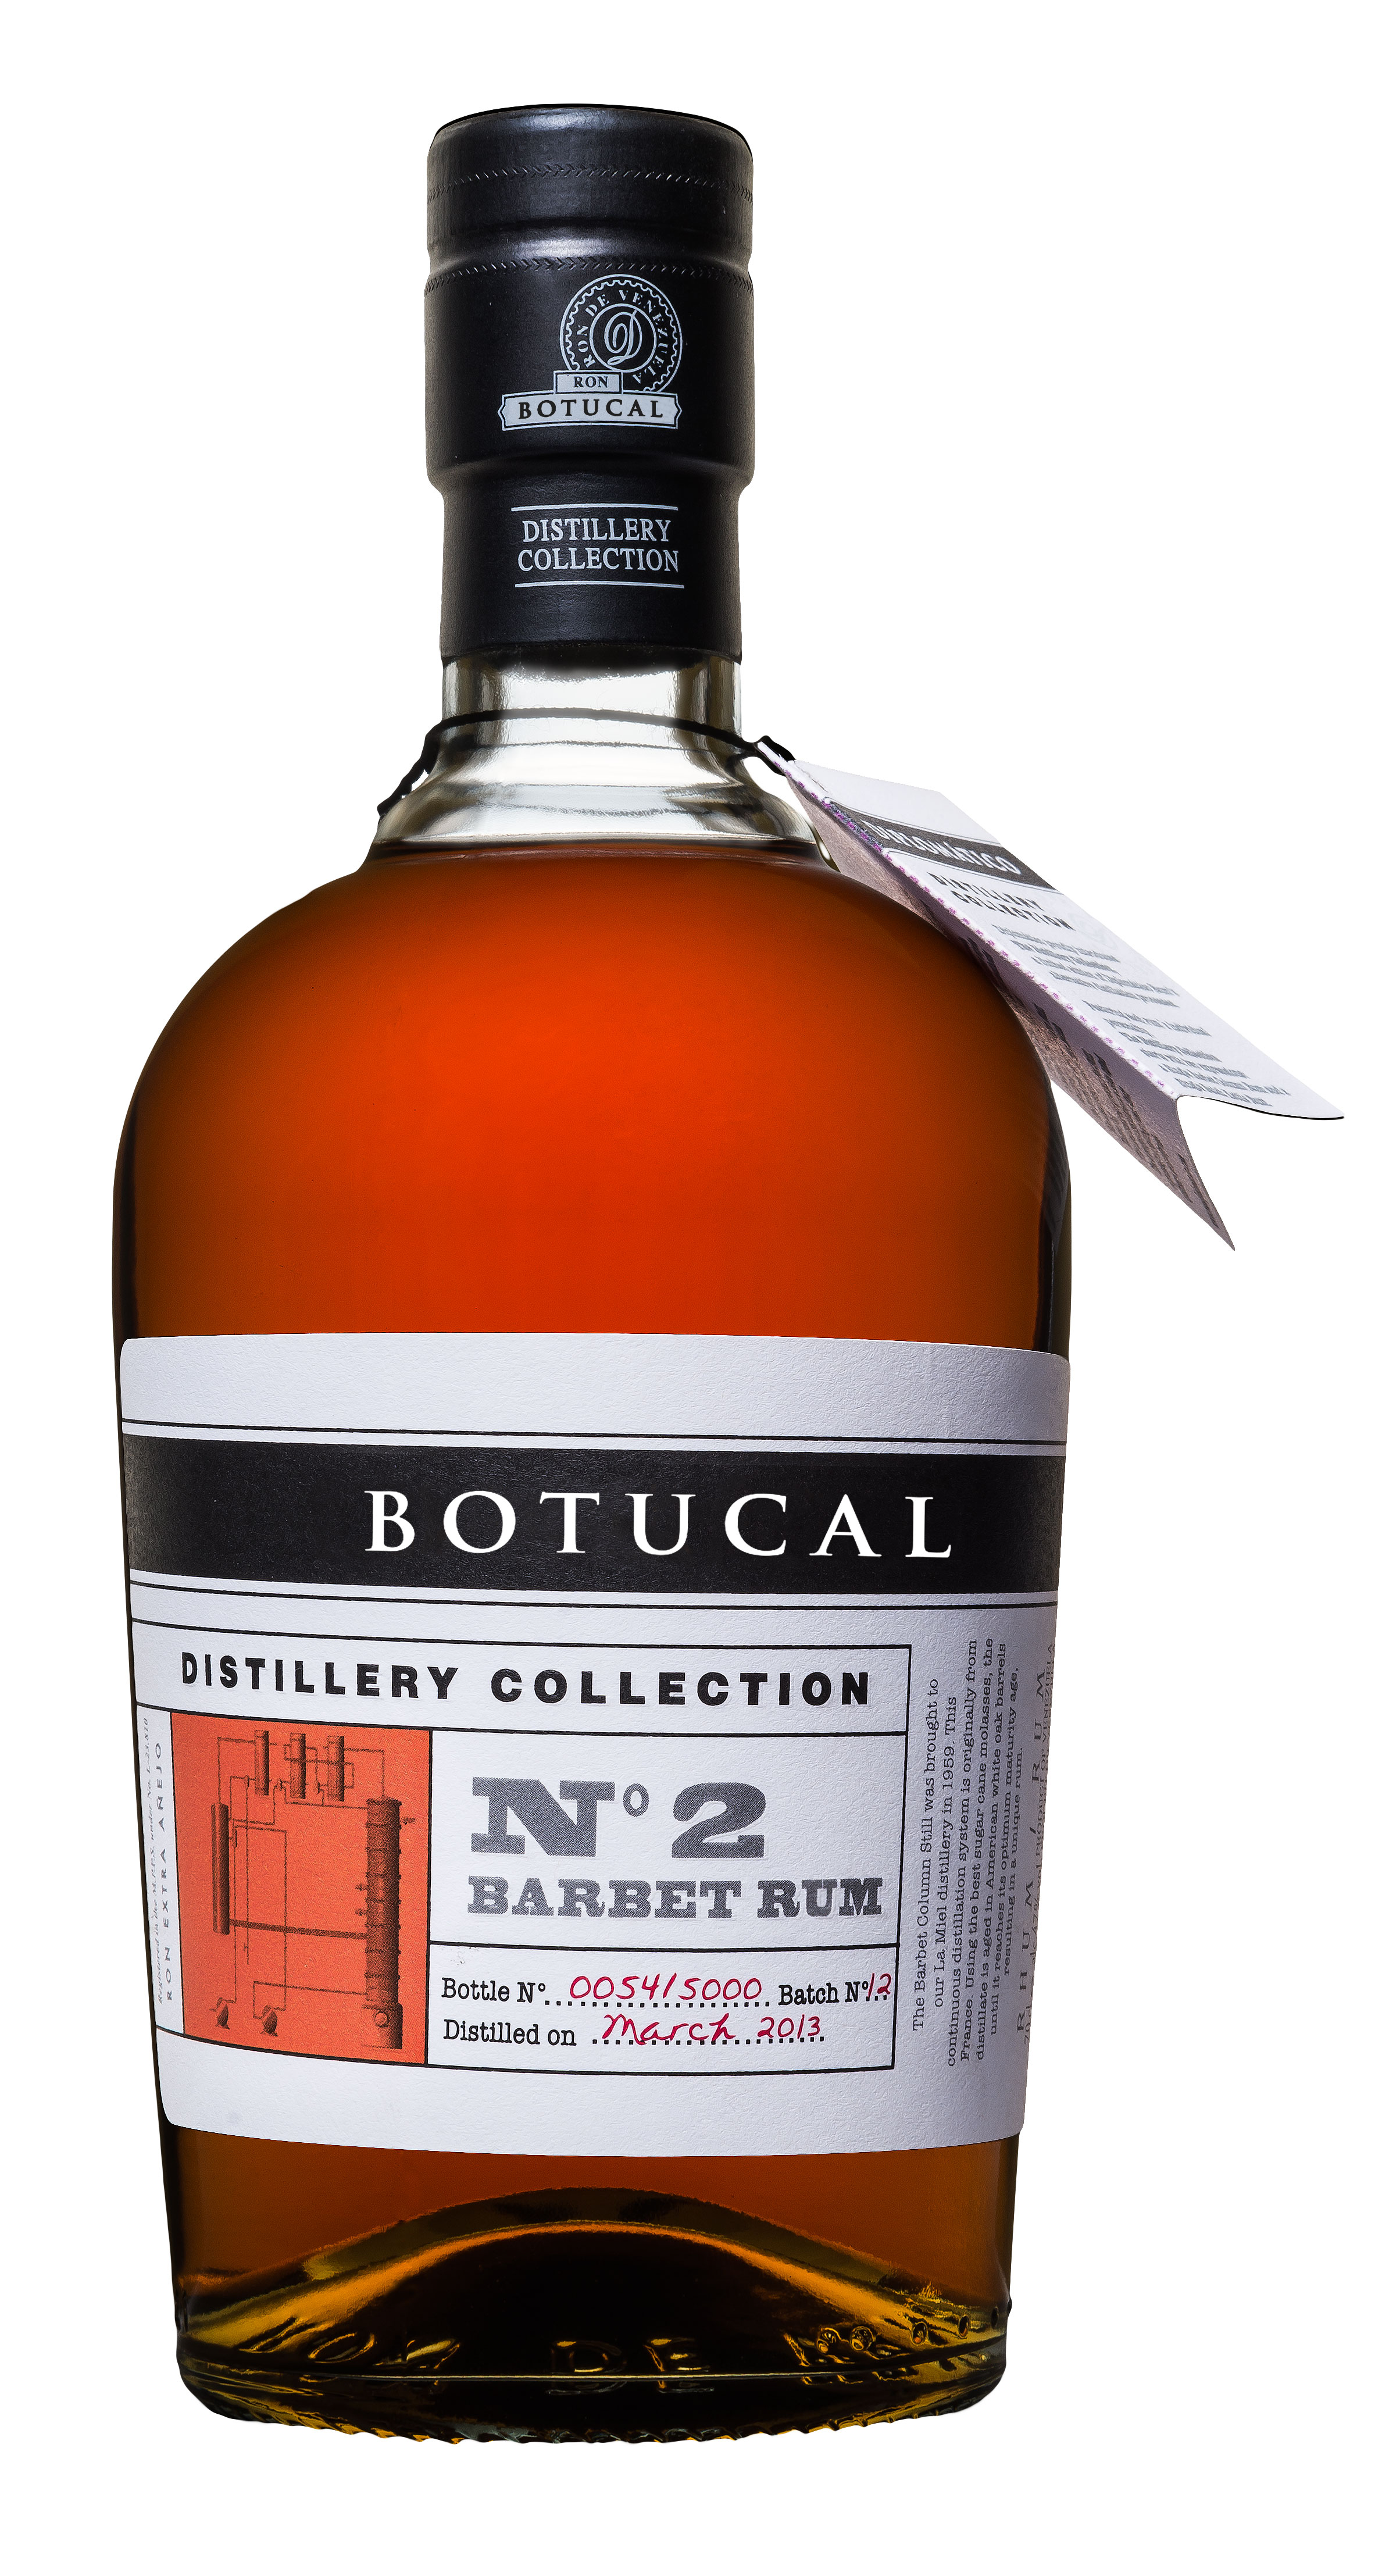 Botucal No2 Barbet Rum Rhum 0,70l (47% Vol) exklusive Sonderausgabe special limited edition distillery collection Ron de Venezuela - [Enthält Sulfite]